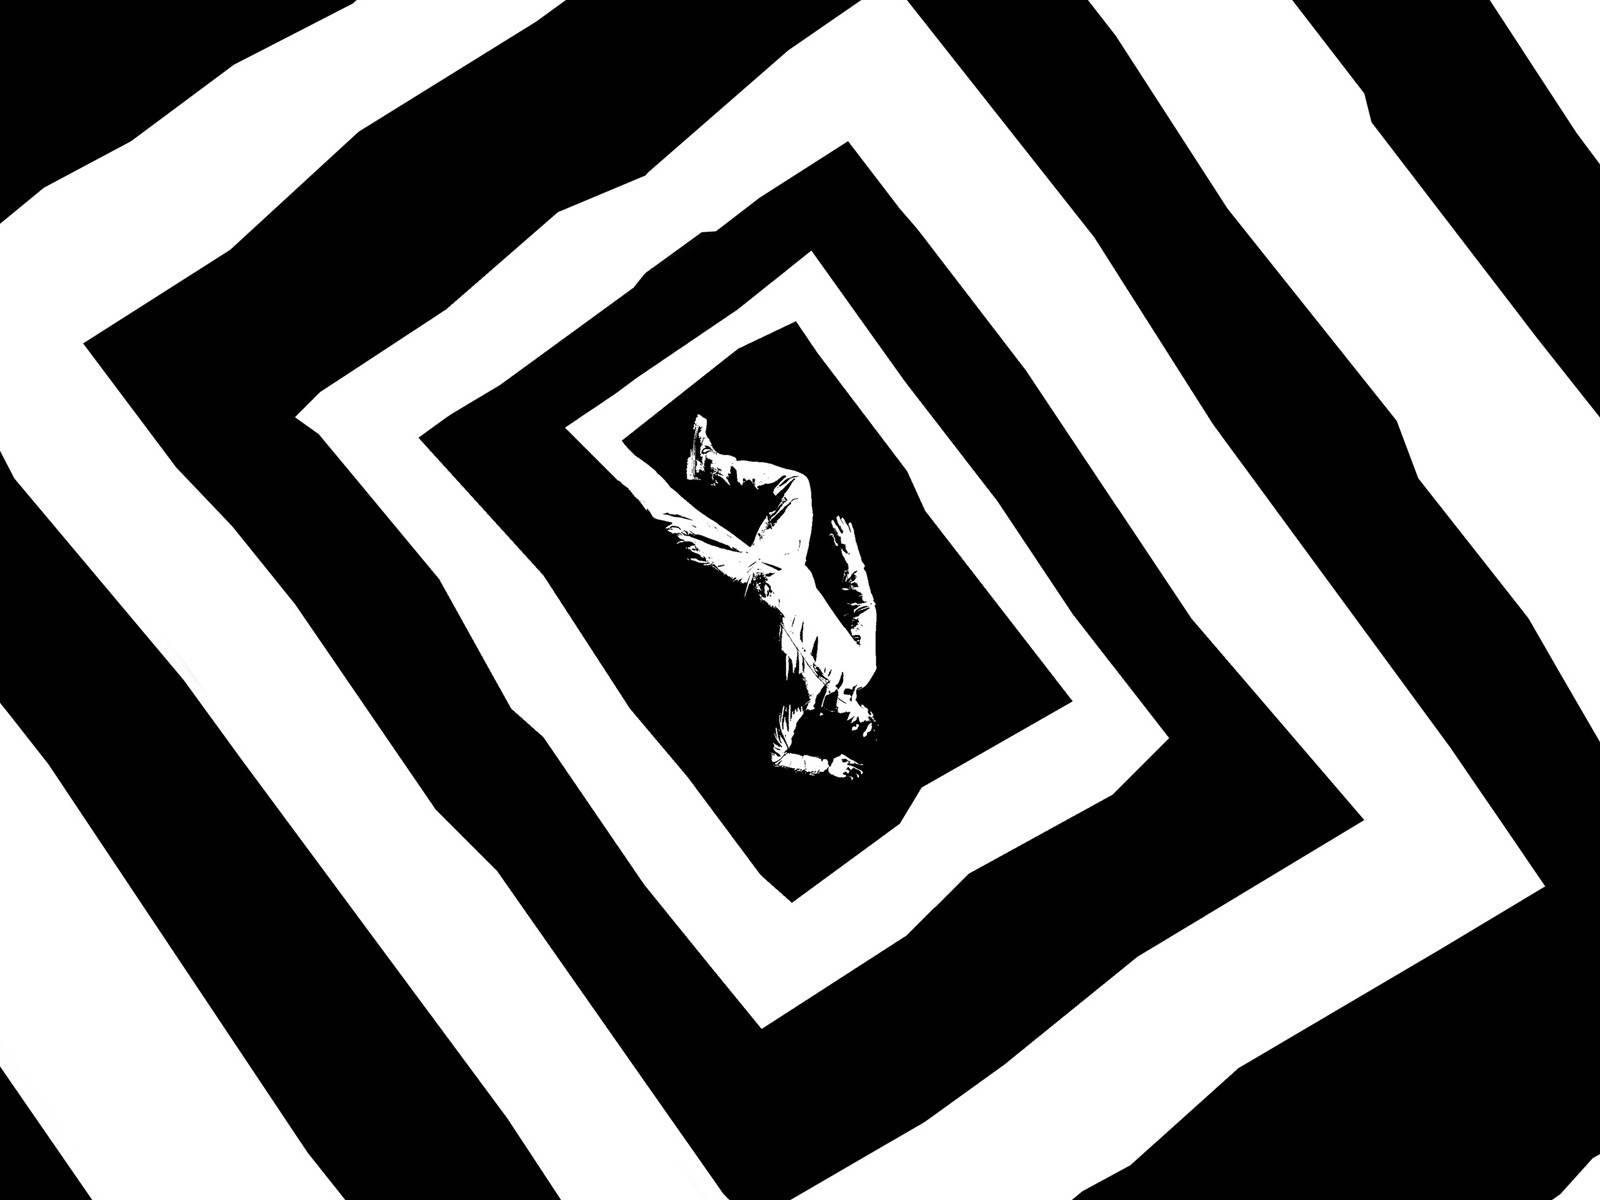 Wonderful Wallpaper Movie Vertigo - abstract_movie_poster_optical_illusion_Alfred_Hitchcock_Vertigo-236018  2018_41885.jpg!d